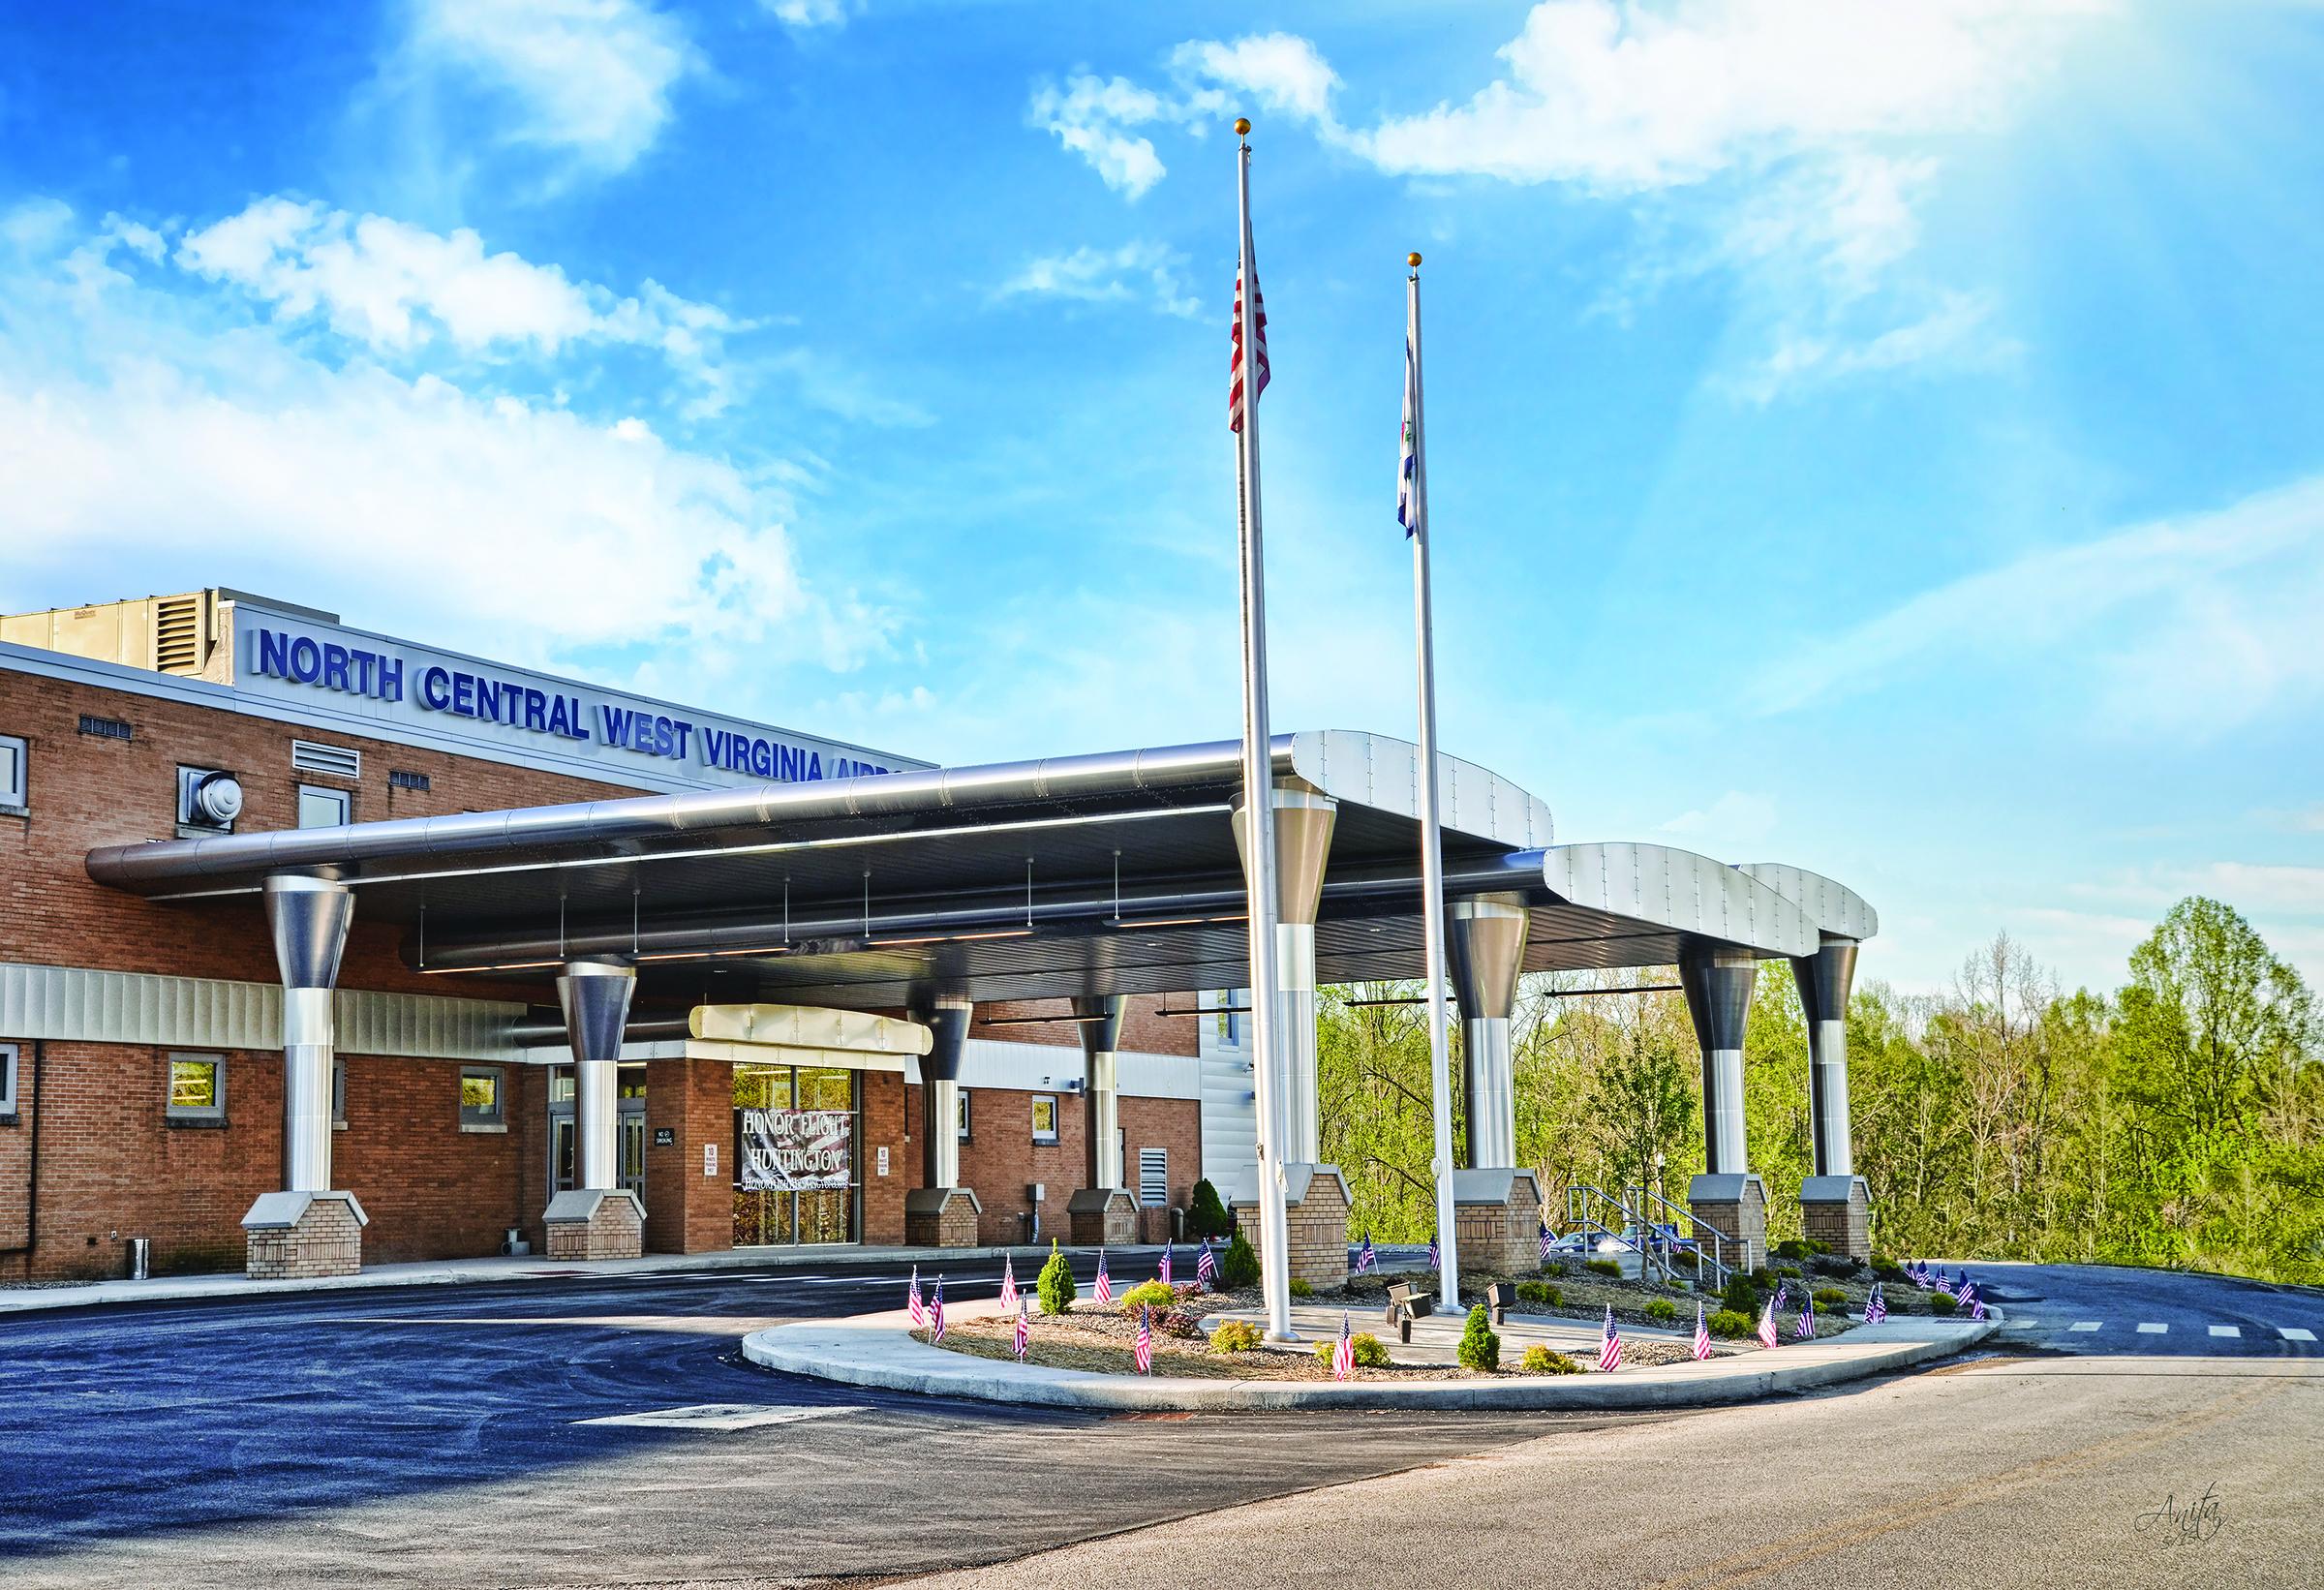 North Central West Virginia Airport Celebrates Exterior Terminal Remodel